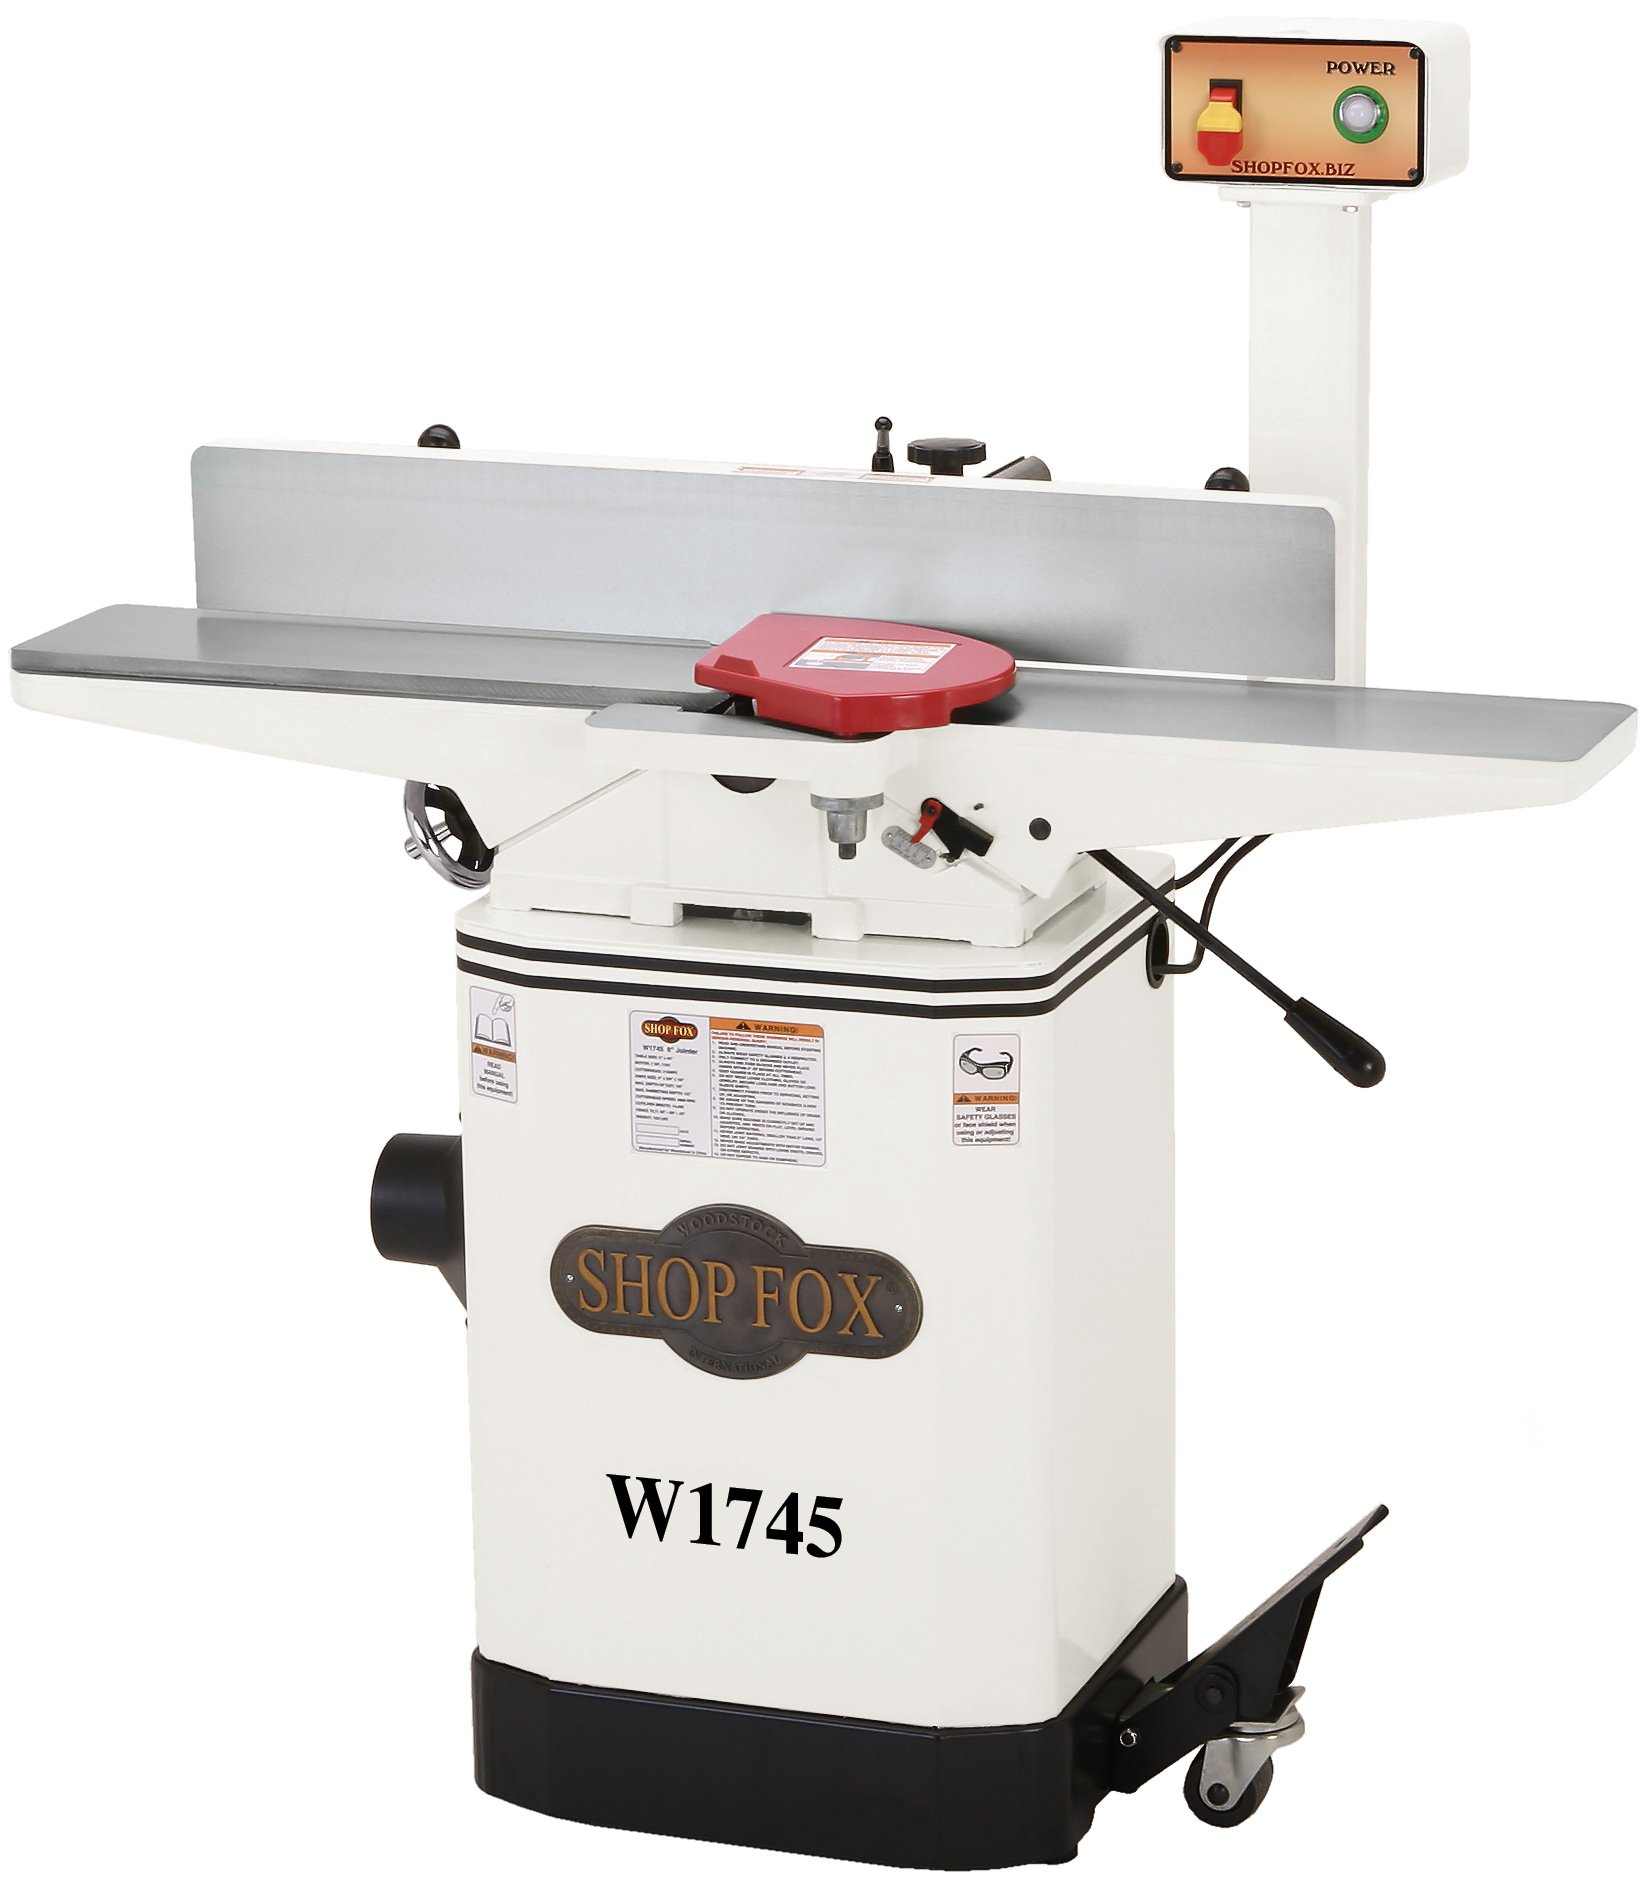 Shop Fox W1745 6in Jointer